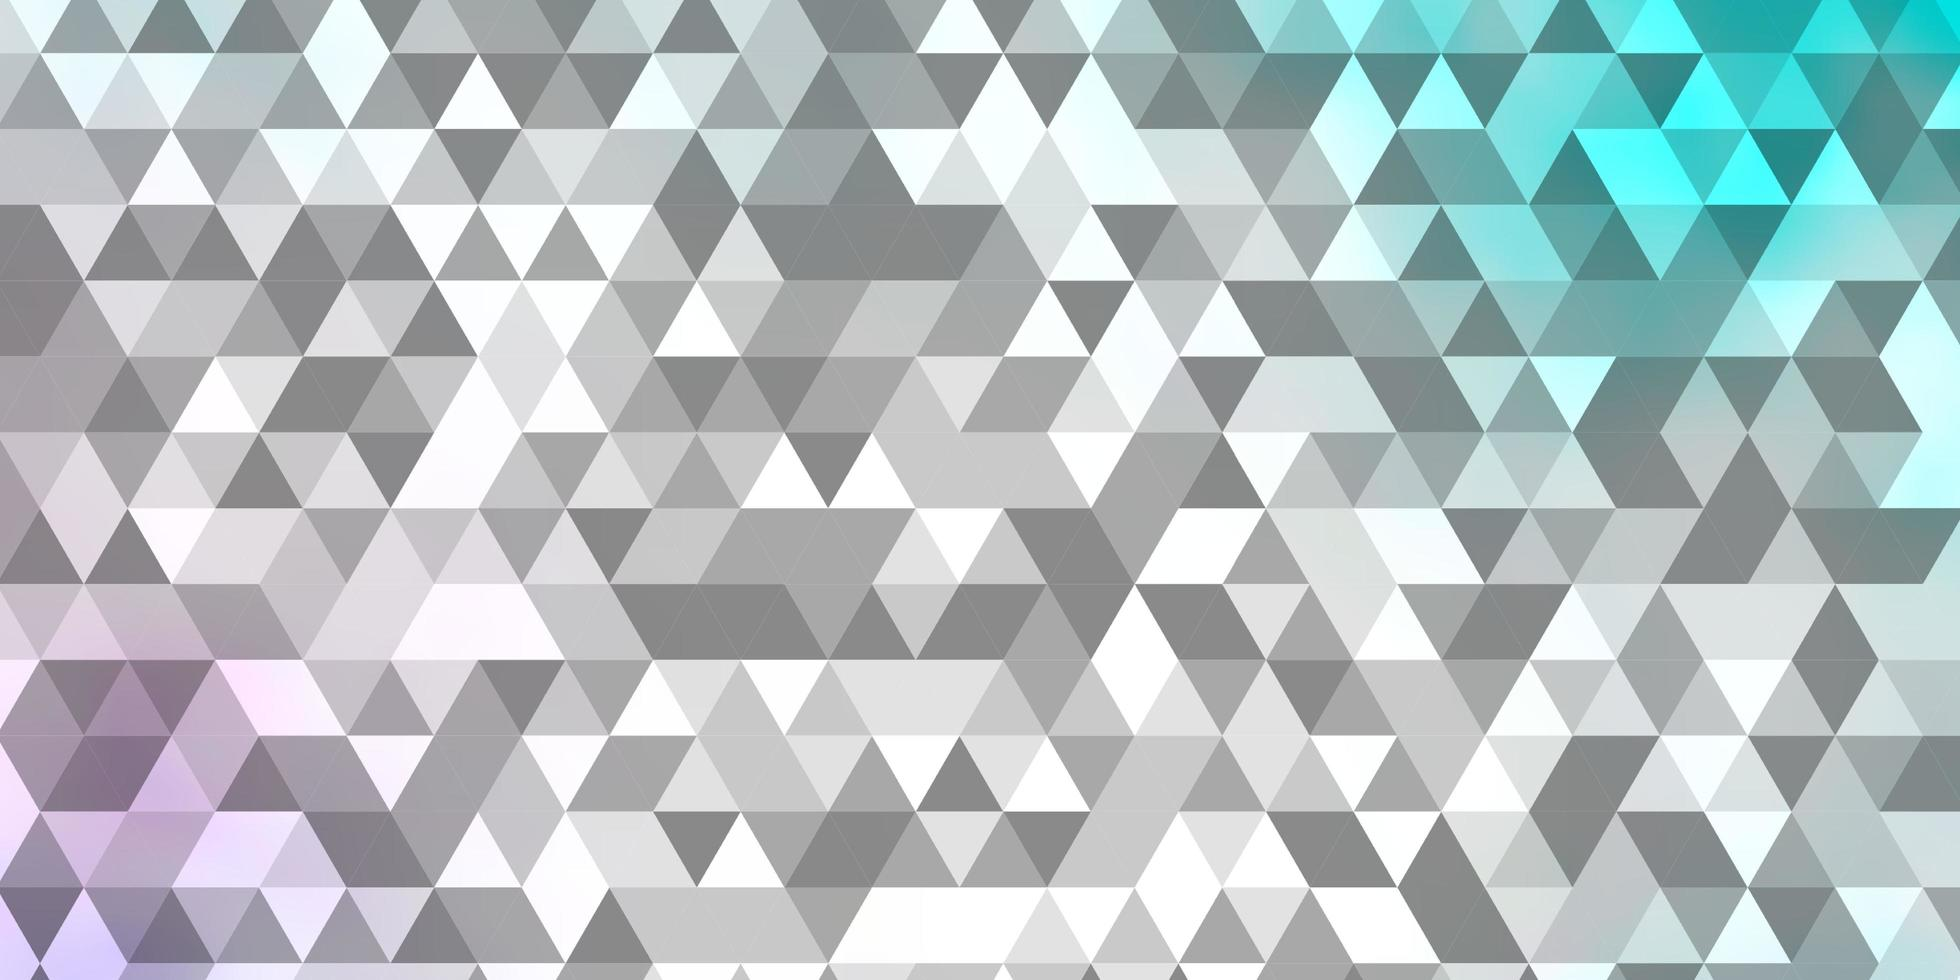 fundo vector rosa claro, azul com triângulos.